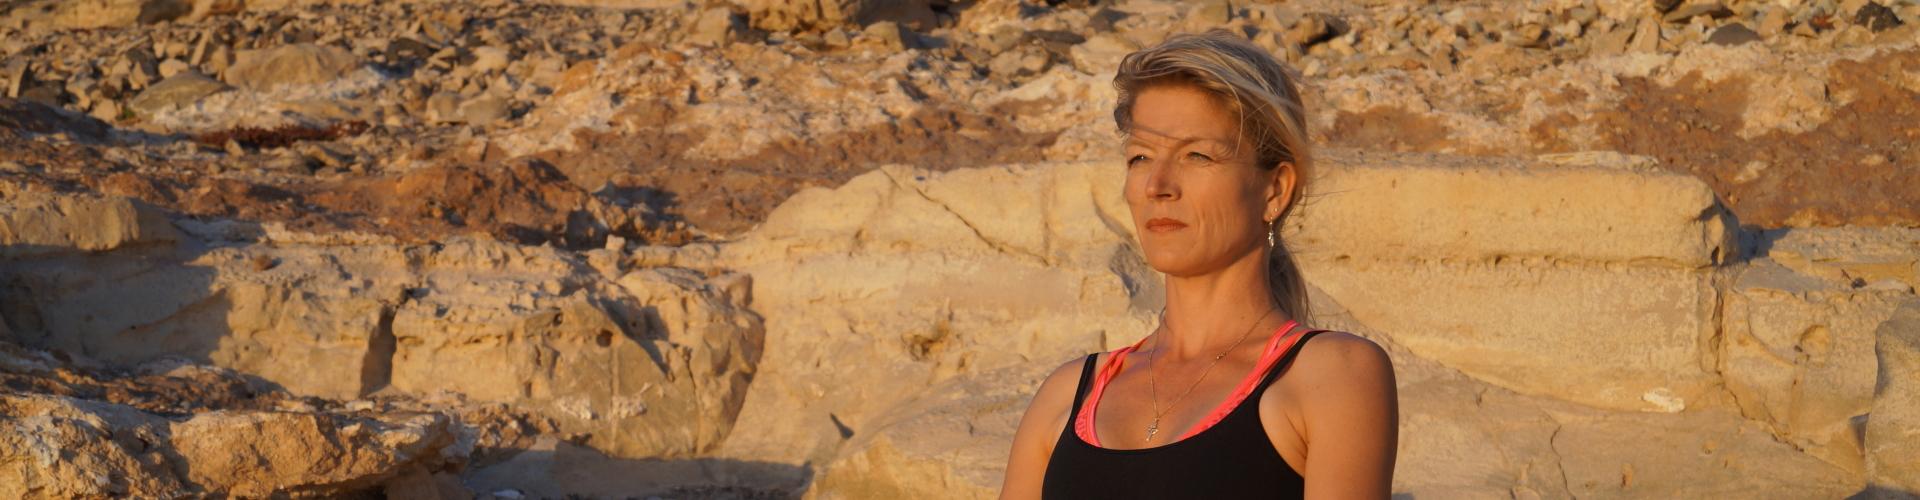 yoga meditatie yoga filosofie teacher docent coaching levensavontuur life adventure gerlinde zoodsma begeleiding